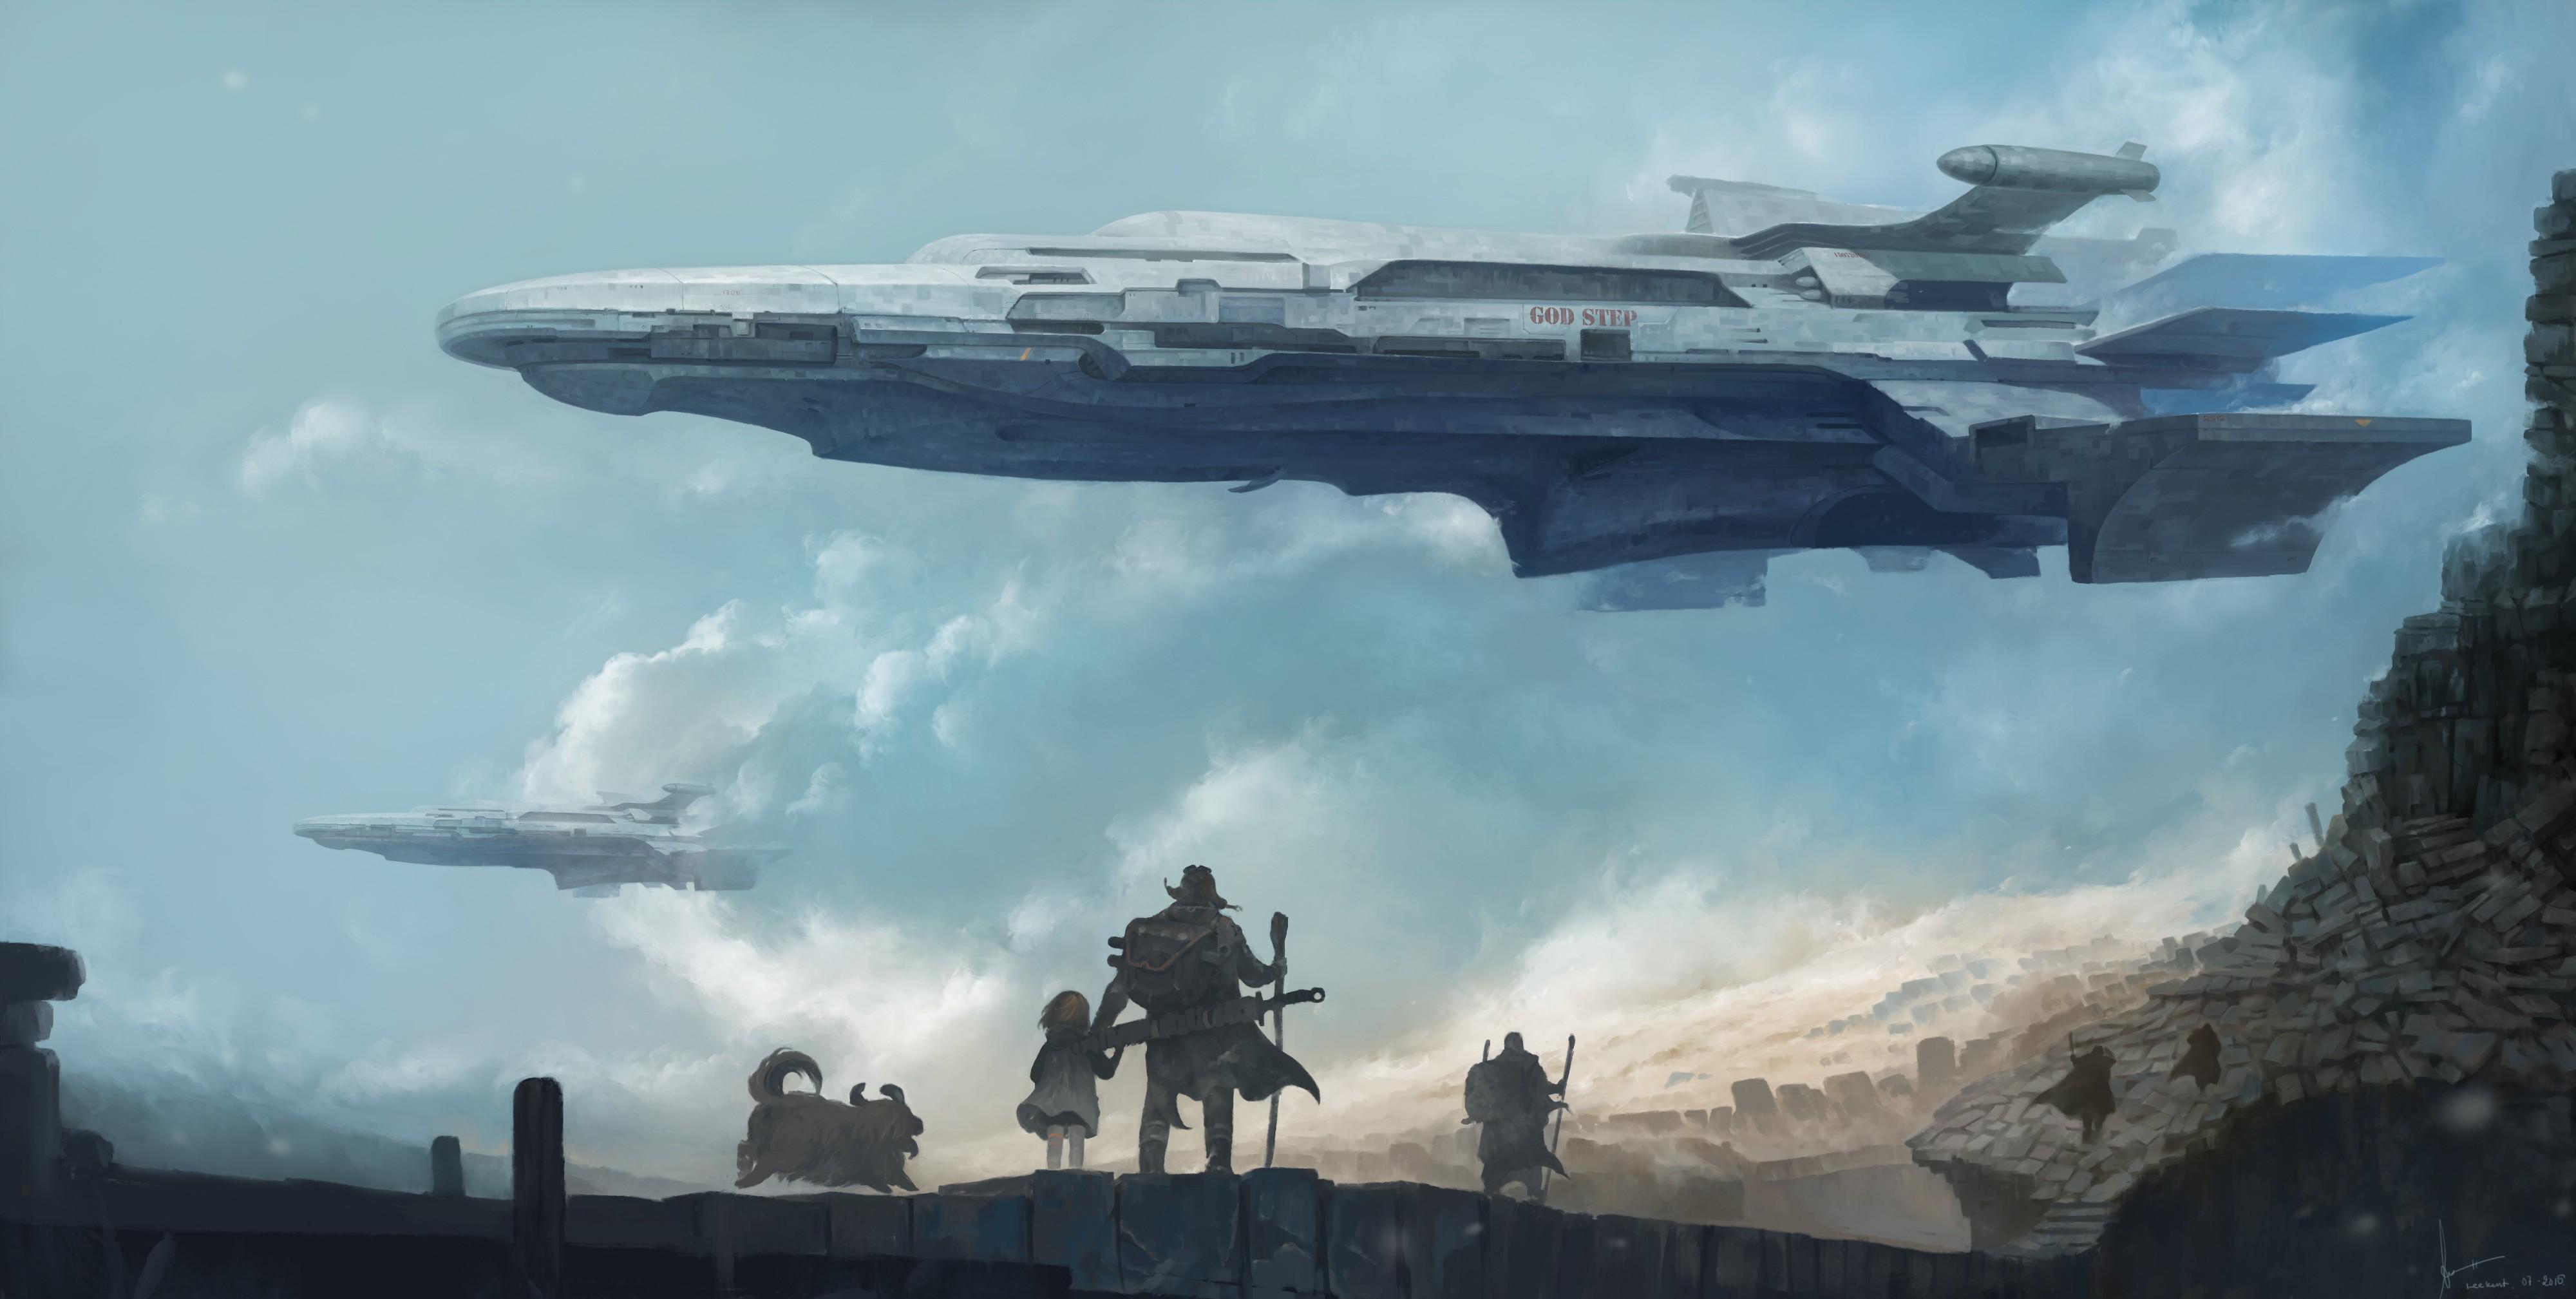 Wallpaper : Fantasy Art, Futuristic, Vehicle, Artwork